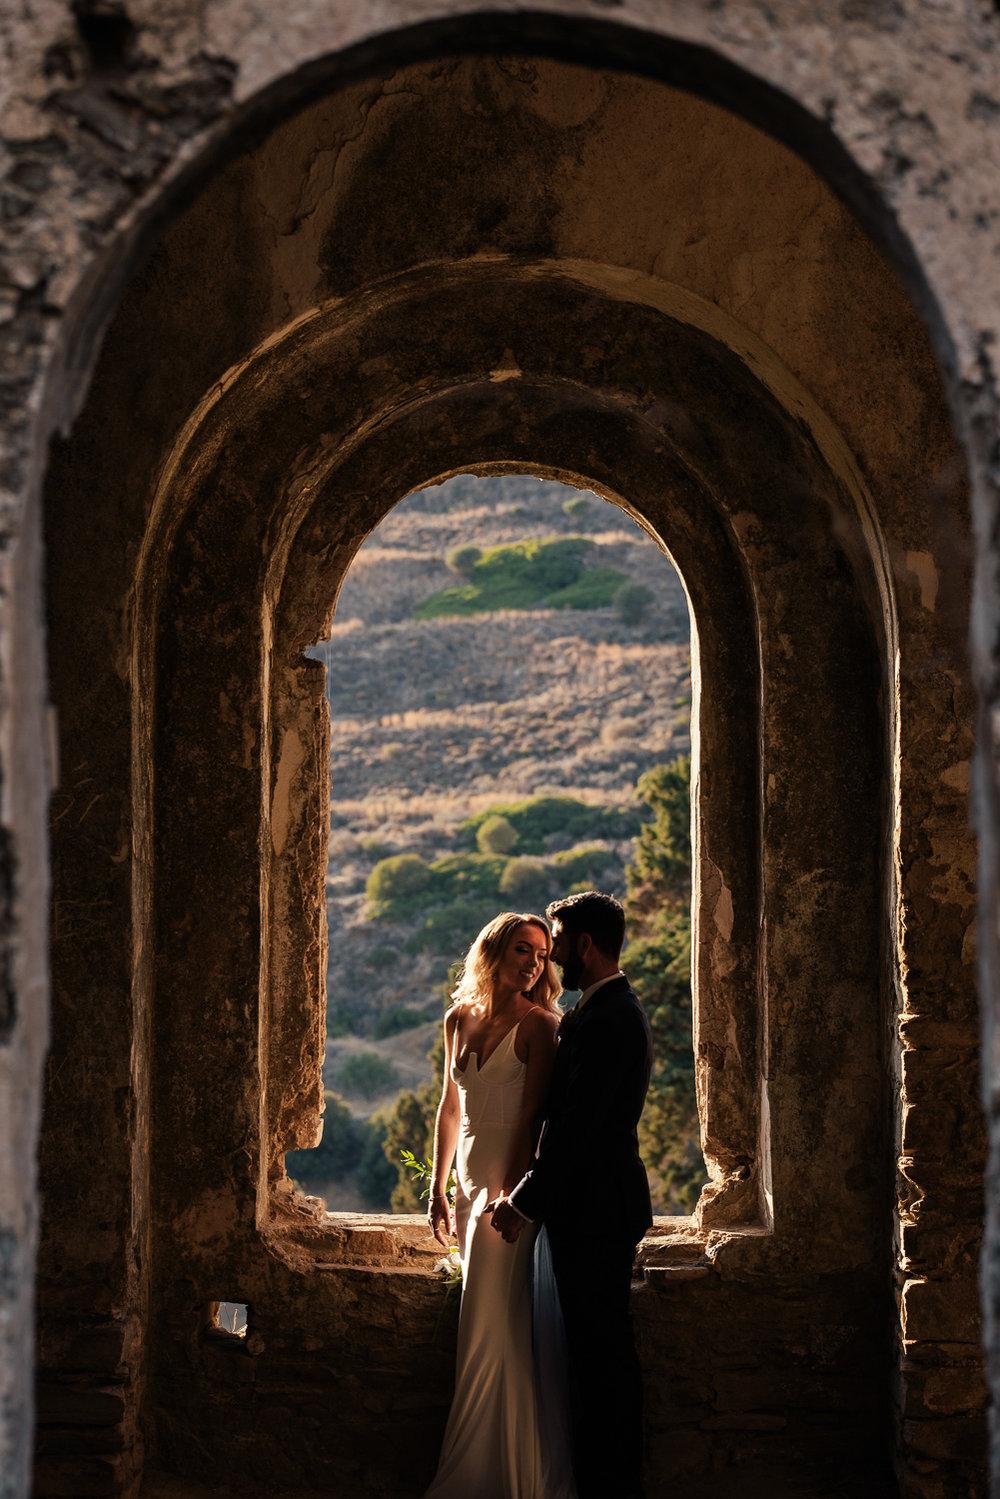 Naxos-Wedding-Marq-Riley-47-lorraine-ciaran-naxos-0336-Q1P_7450-.jpg